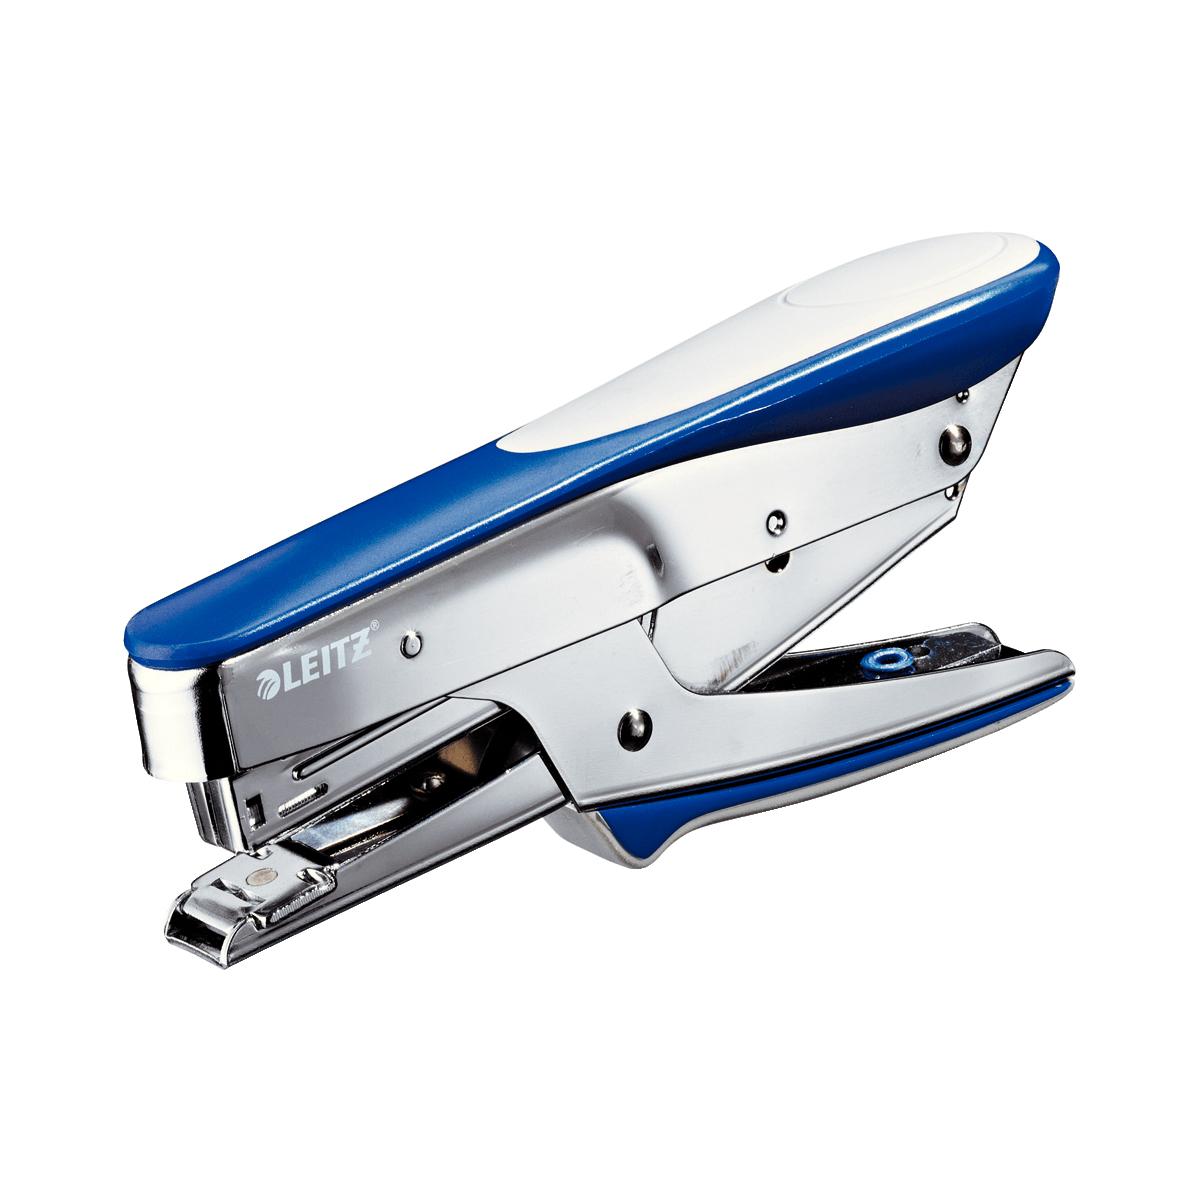 Capsator Tip Cleşte, 5545, Albastru Metal, Leitz